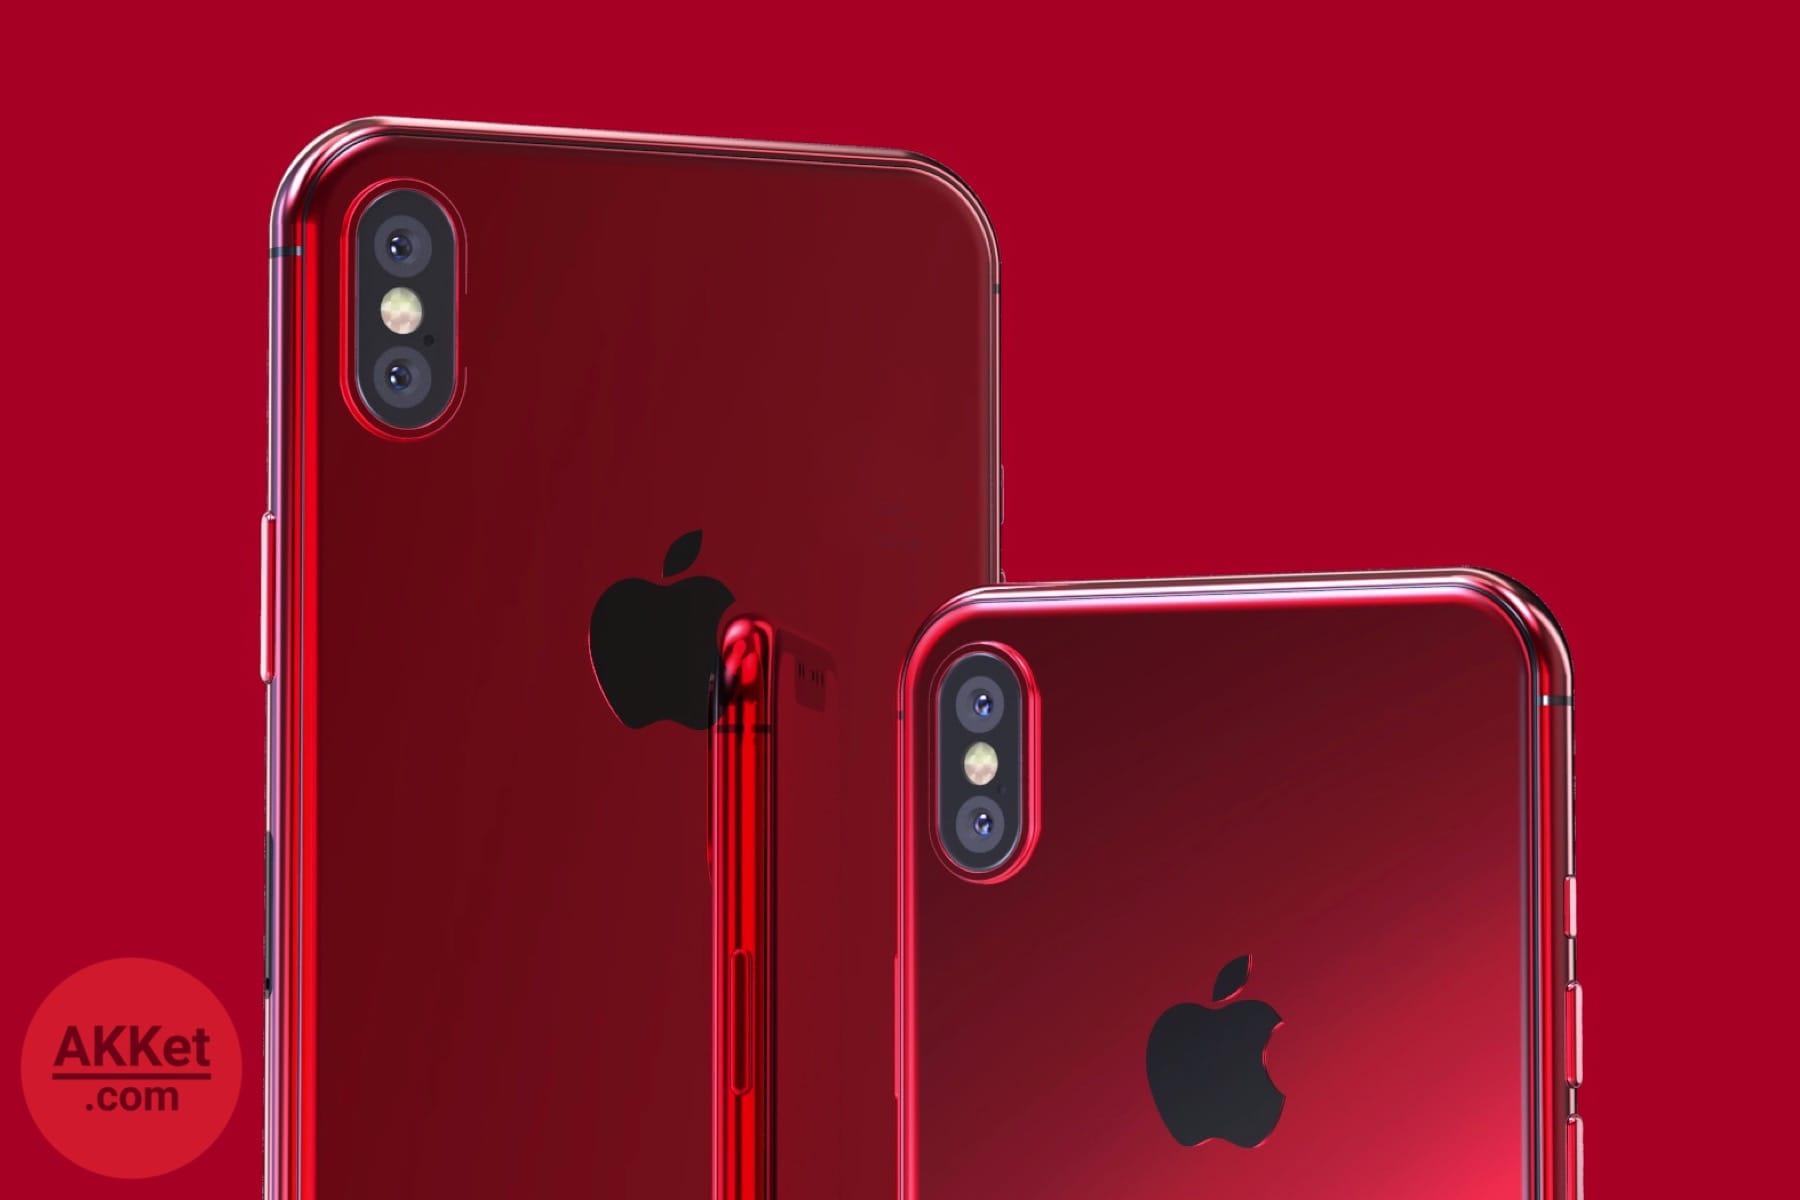 Красный iPhone X на видео и изображениях от AKKet.com